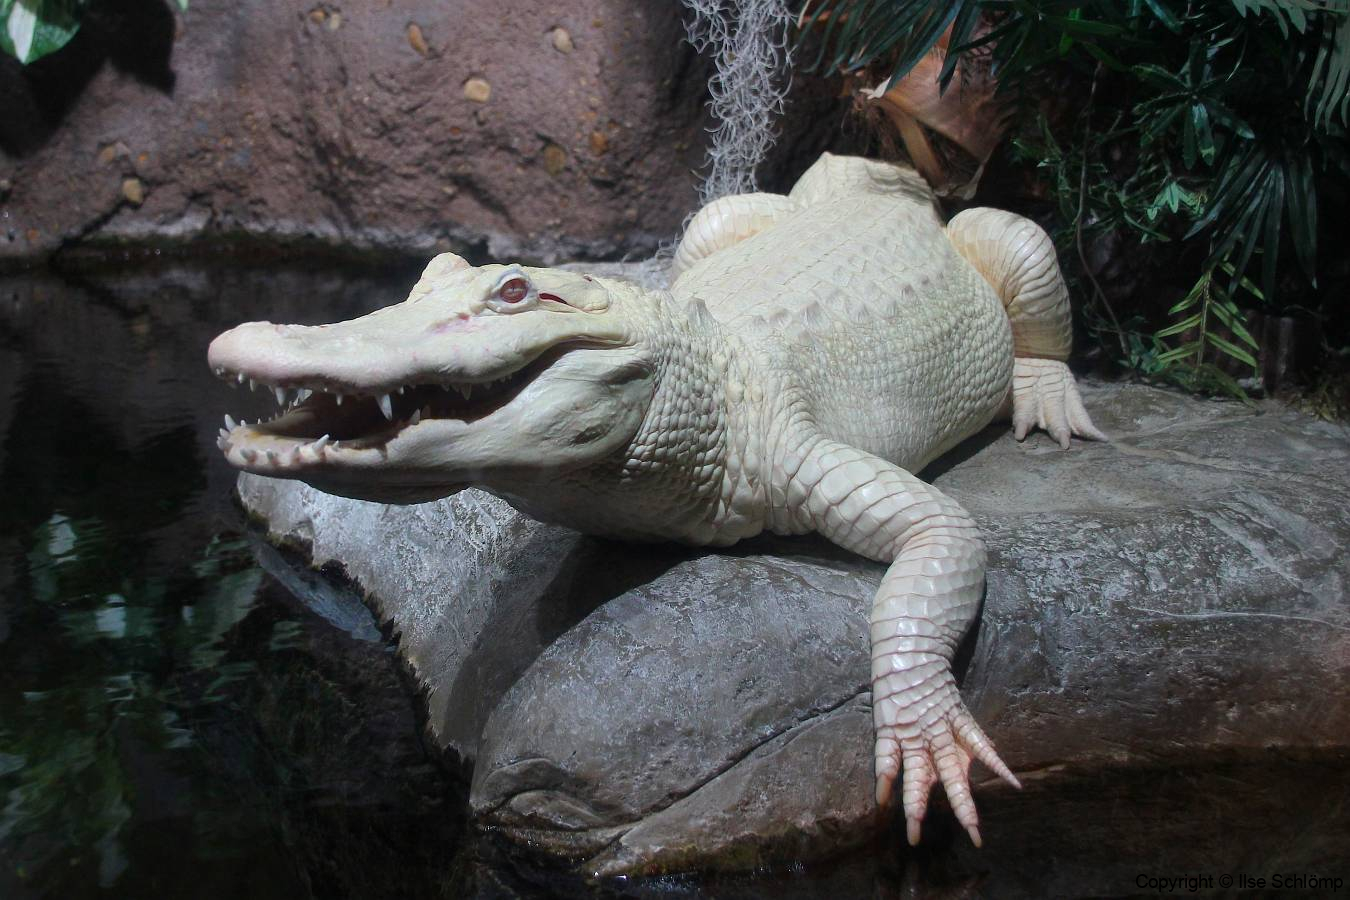 USA, Georgia, Atlanta, Georgia Aquarium, Albino Krokodil